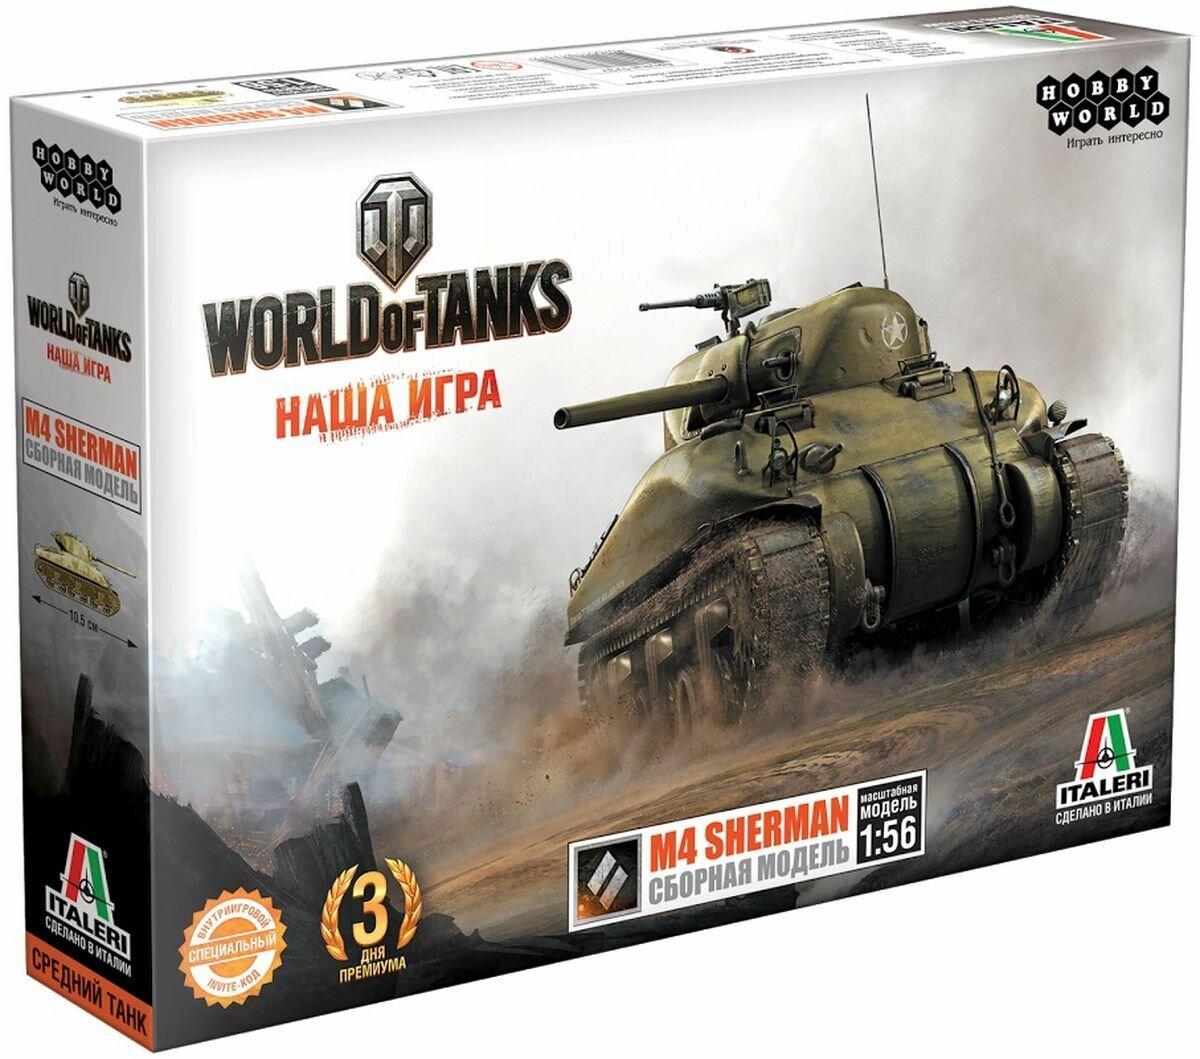 World of Tanks Сборная модель Танк M4 Sherman